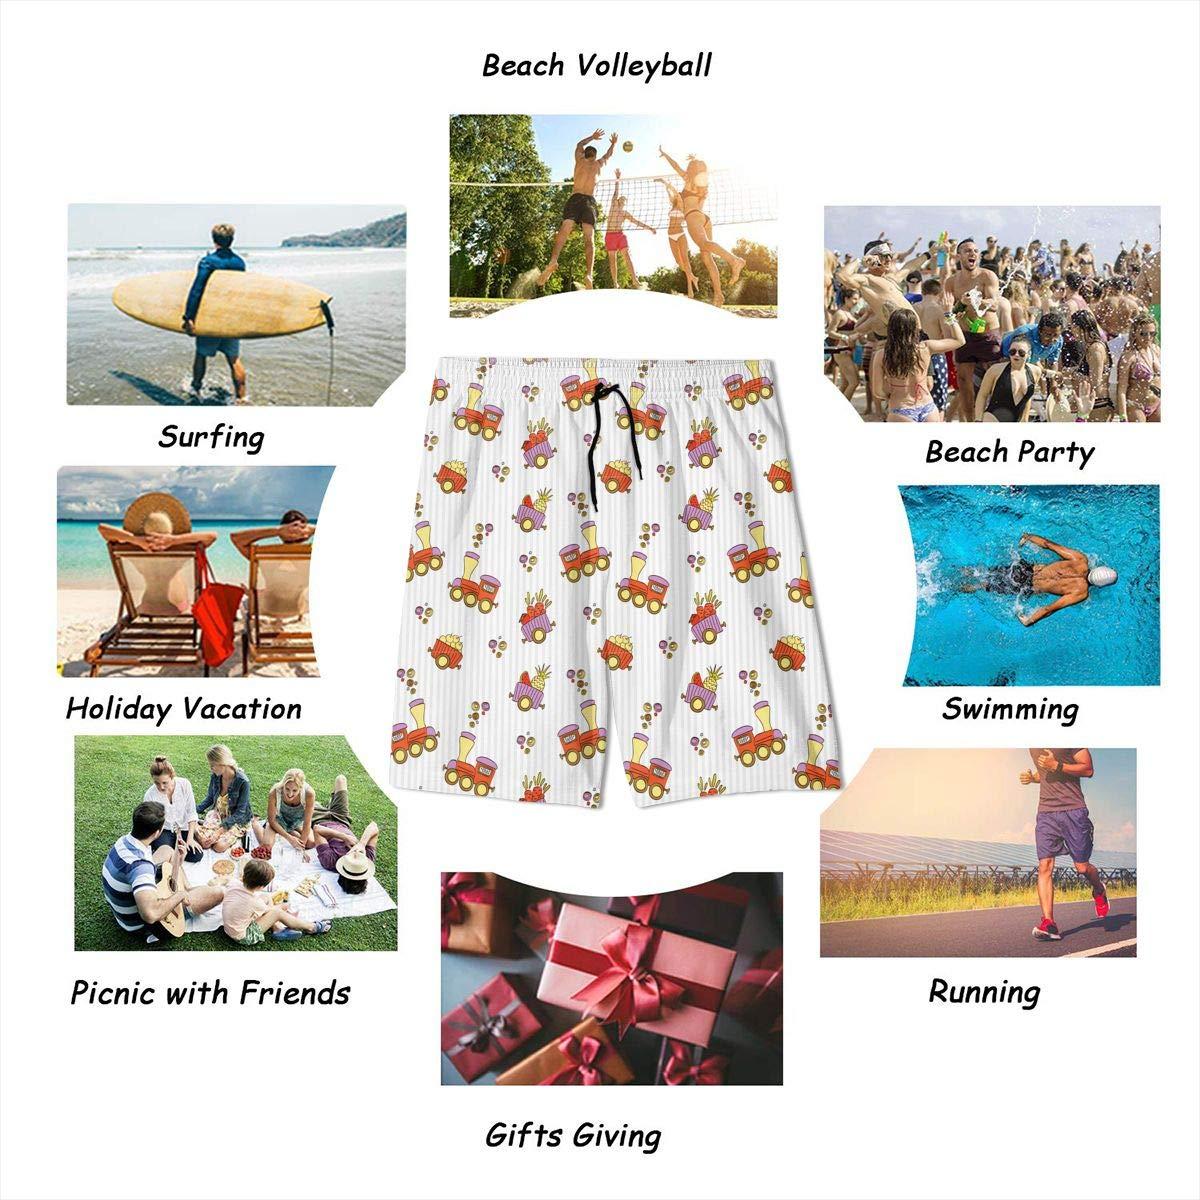 Polyester Many Small Locomotives Pattern Swimsuit with Pockets GI80@KU Teen Casual Swim Trunks